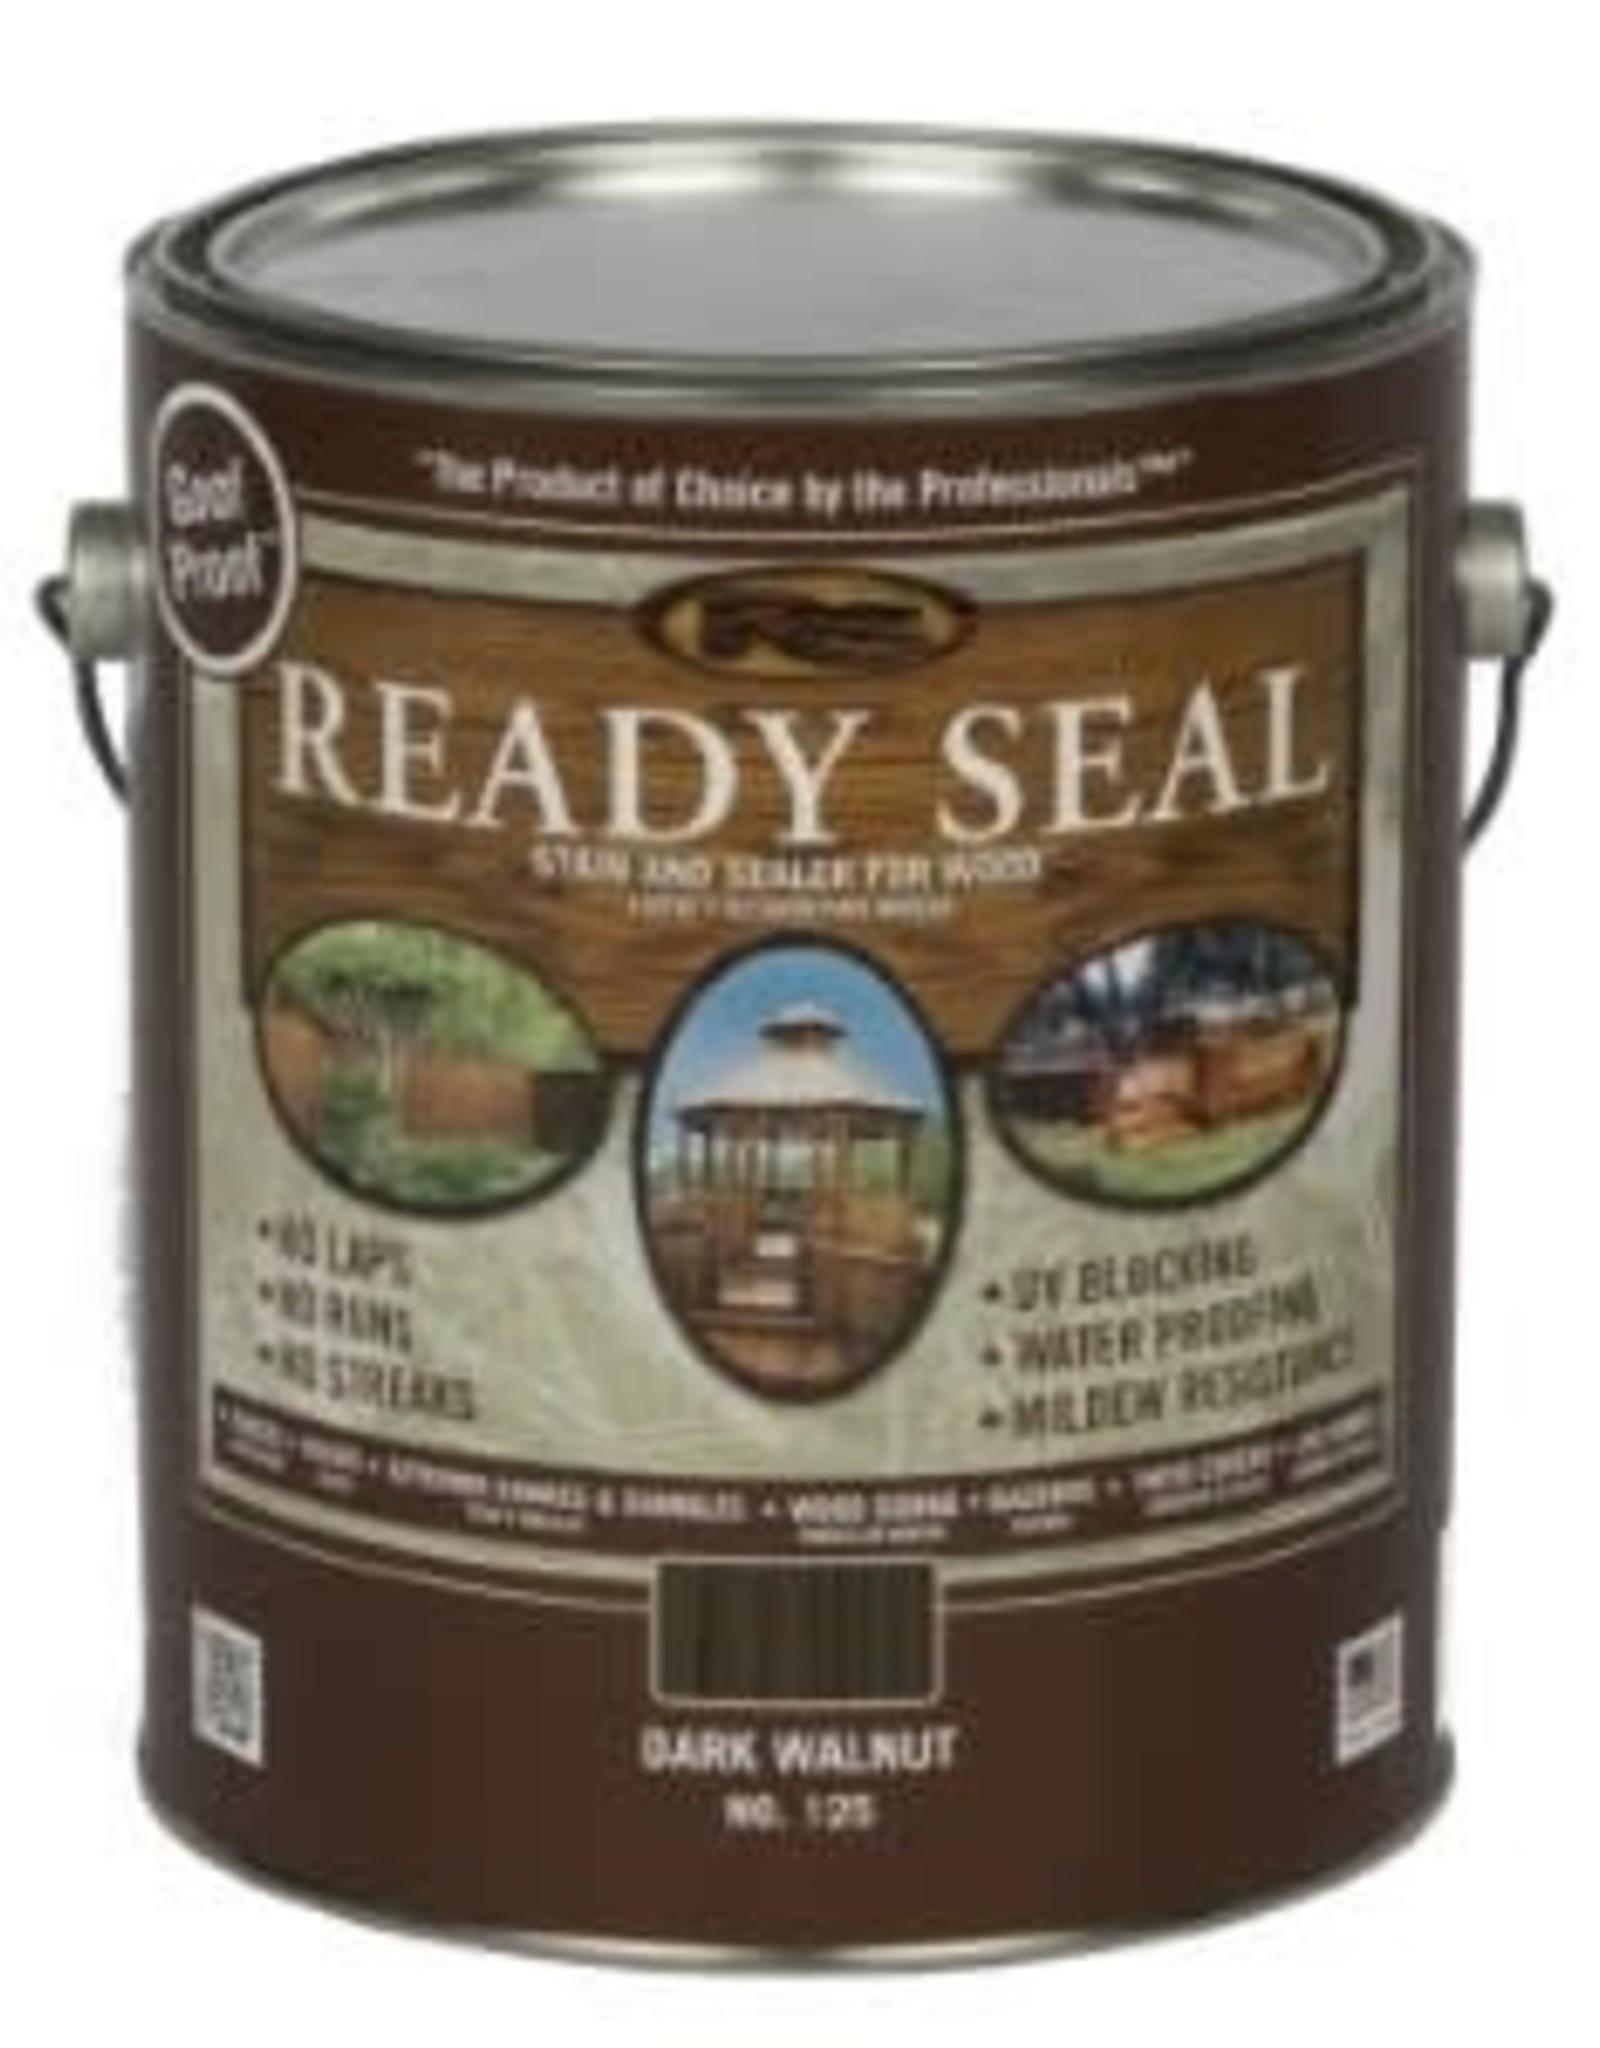 Ready Seal Ready Seal - 1 - Gallon - Dark Walnut